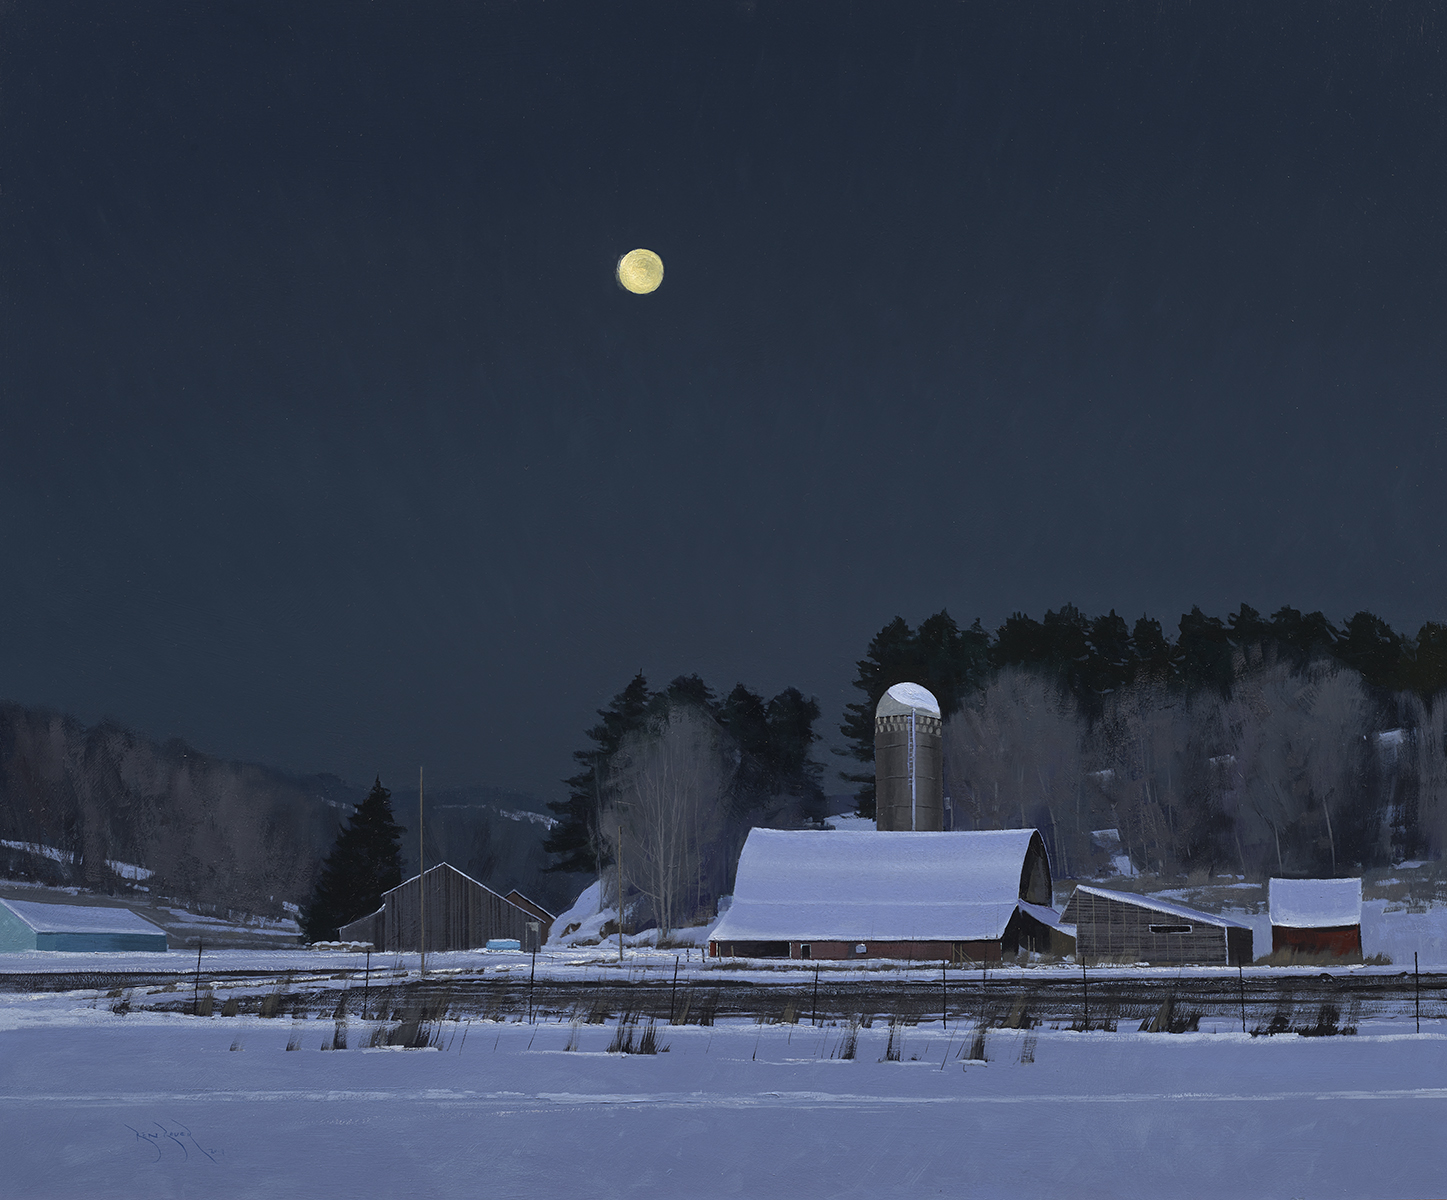 ben_bauer_bb1106_moonset_7_minutes_to_sun_up.jpg